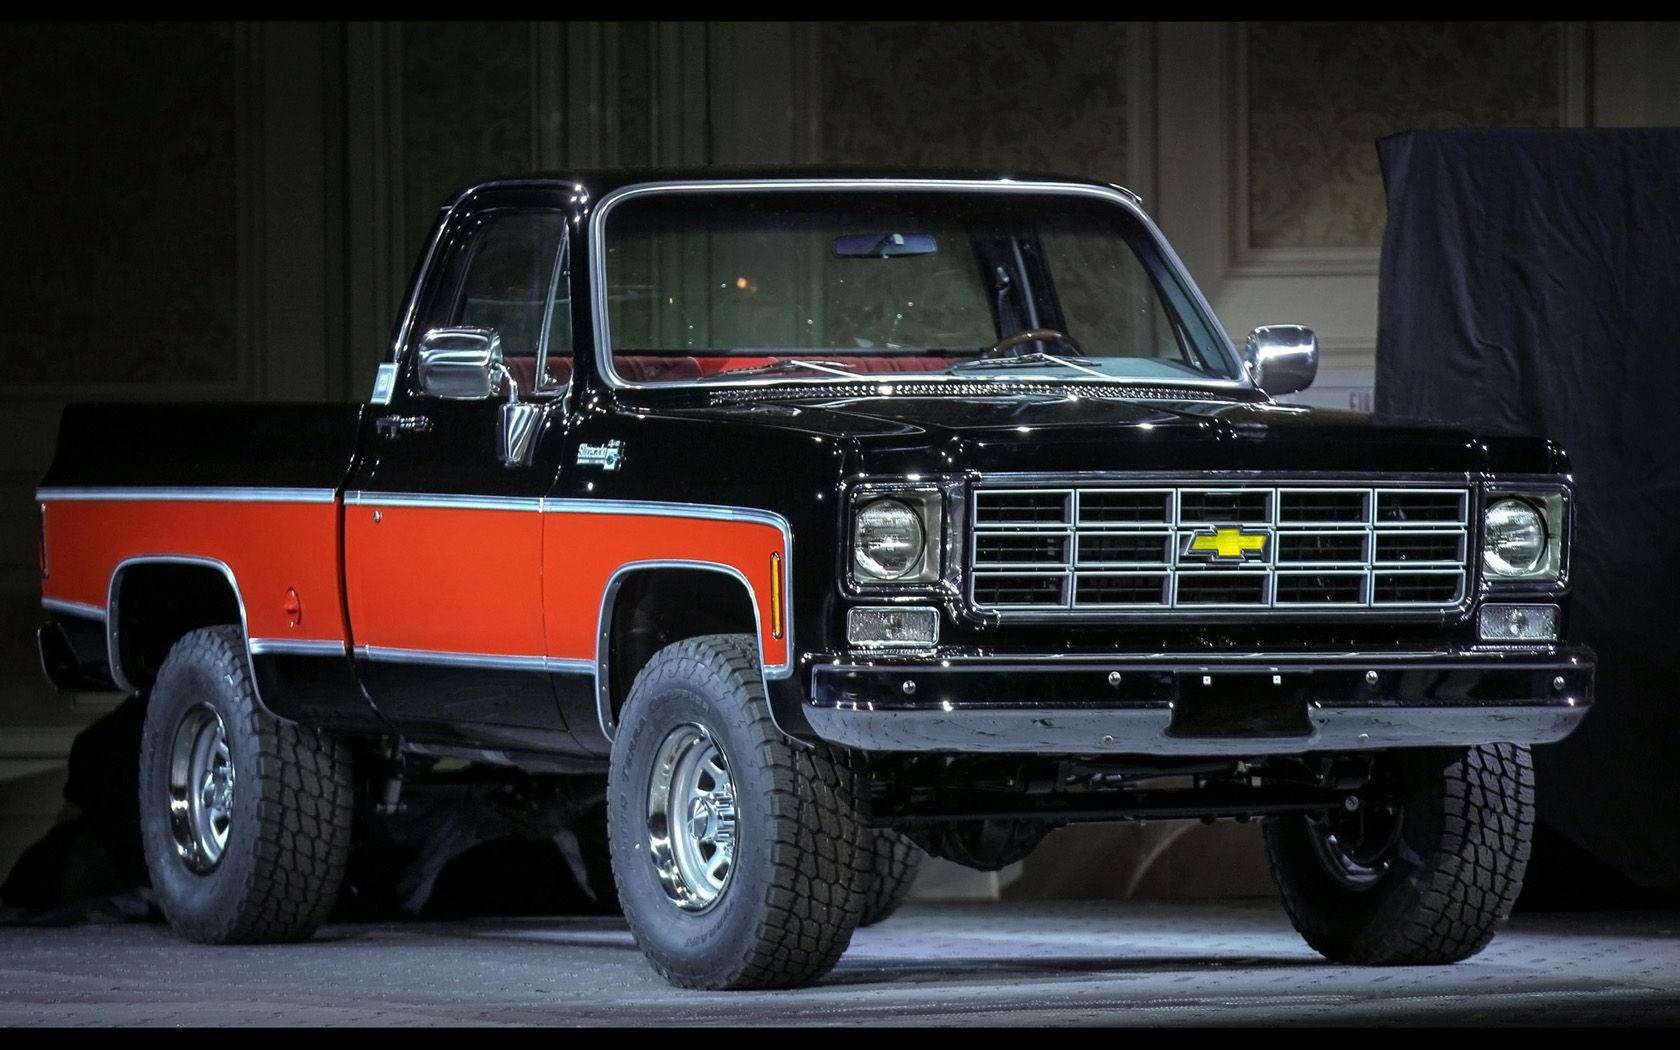 Chevrolet truck wallpaper full hd ydj